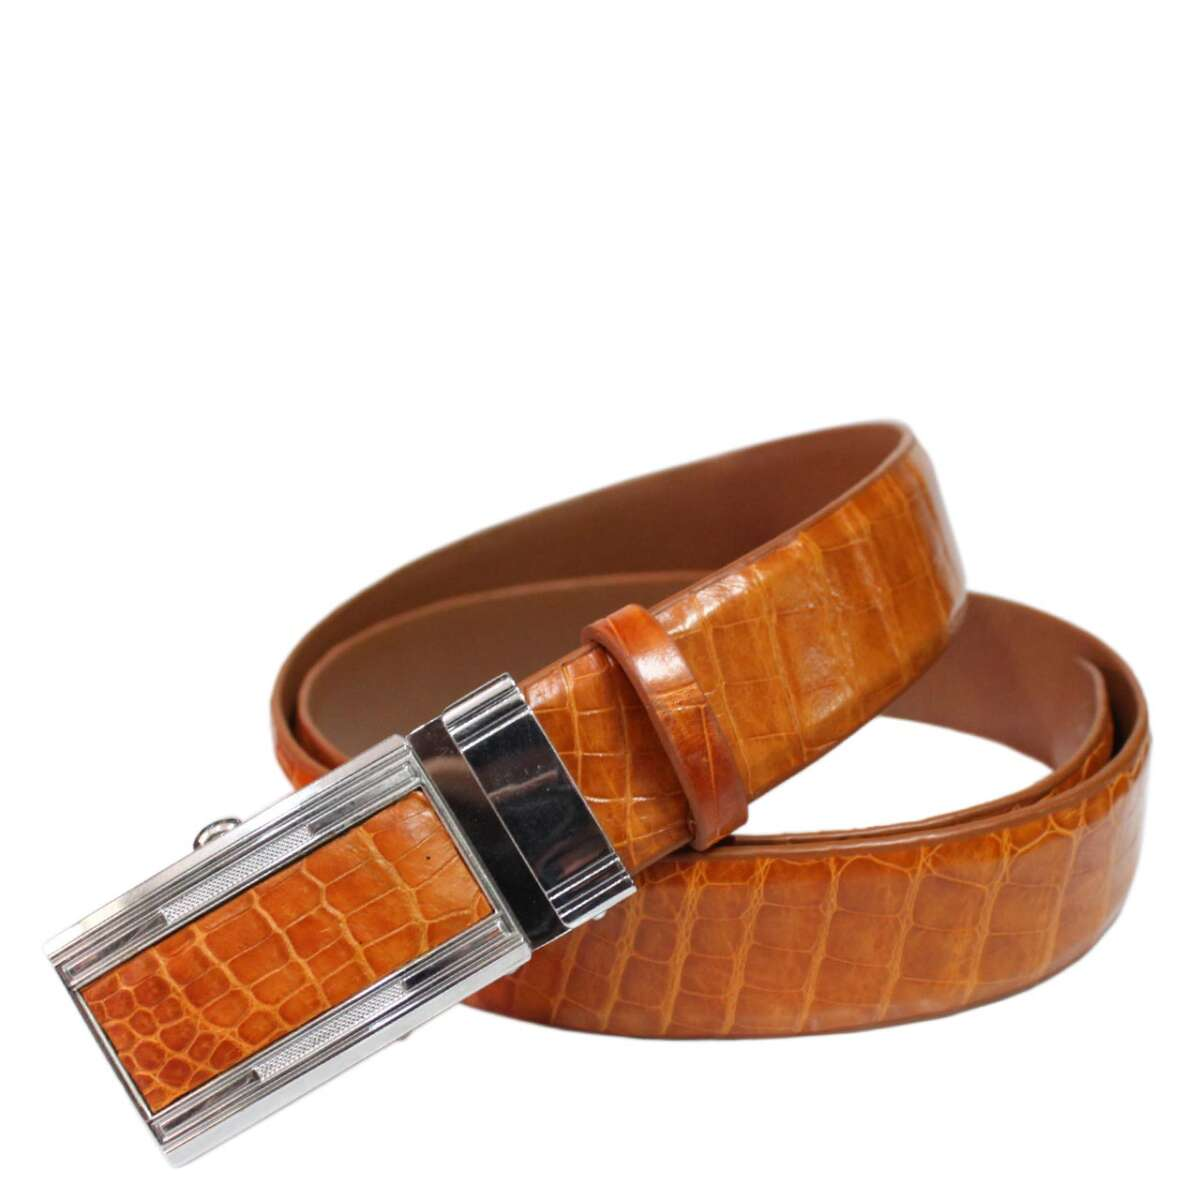 Crocodile leather belt S607c